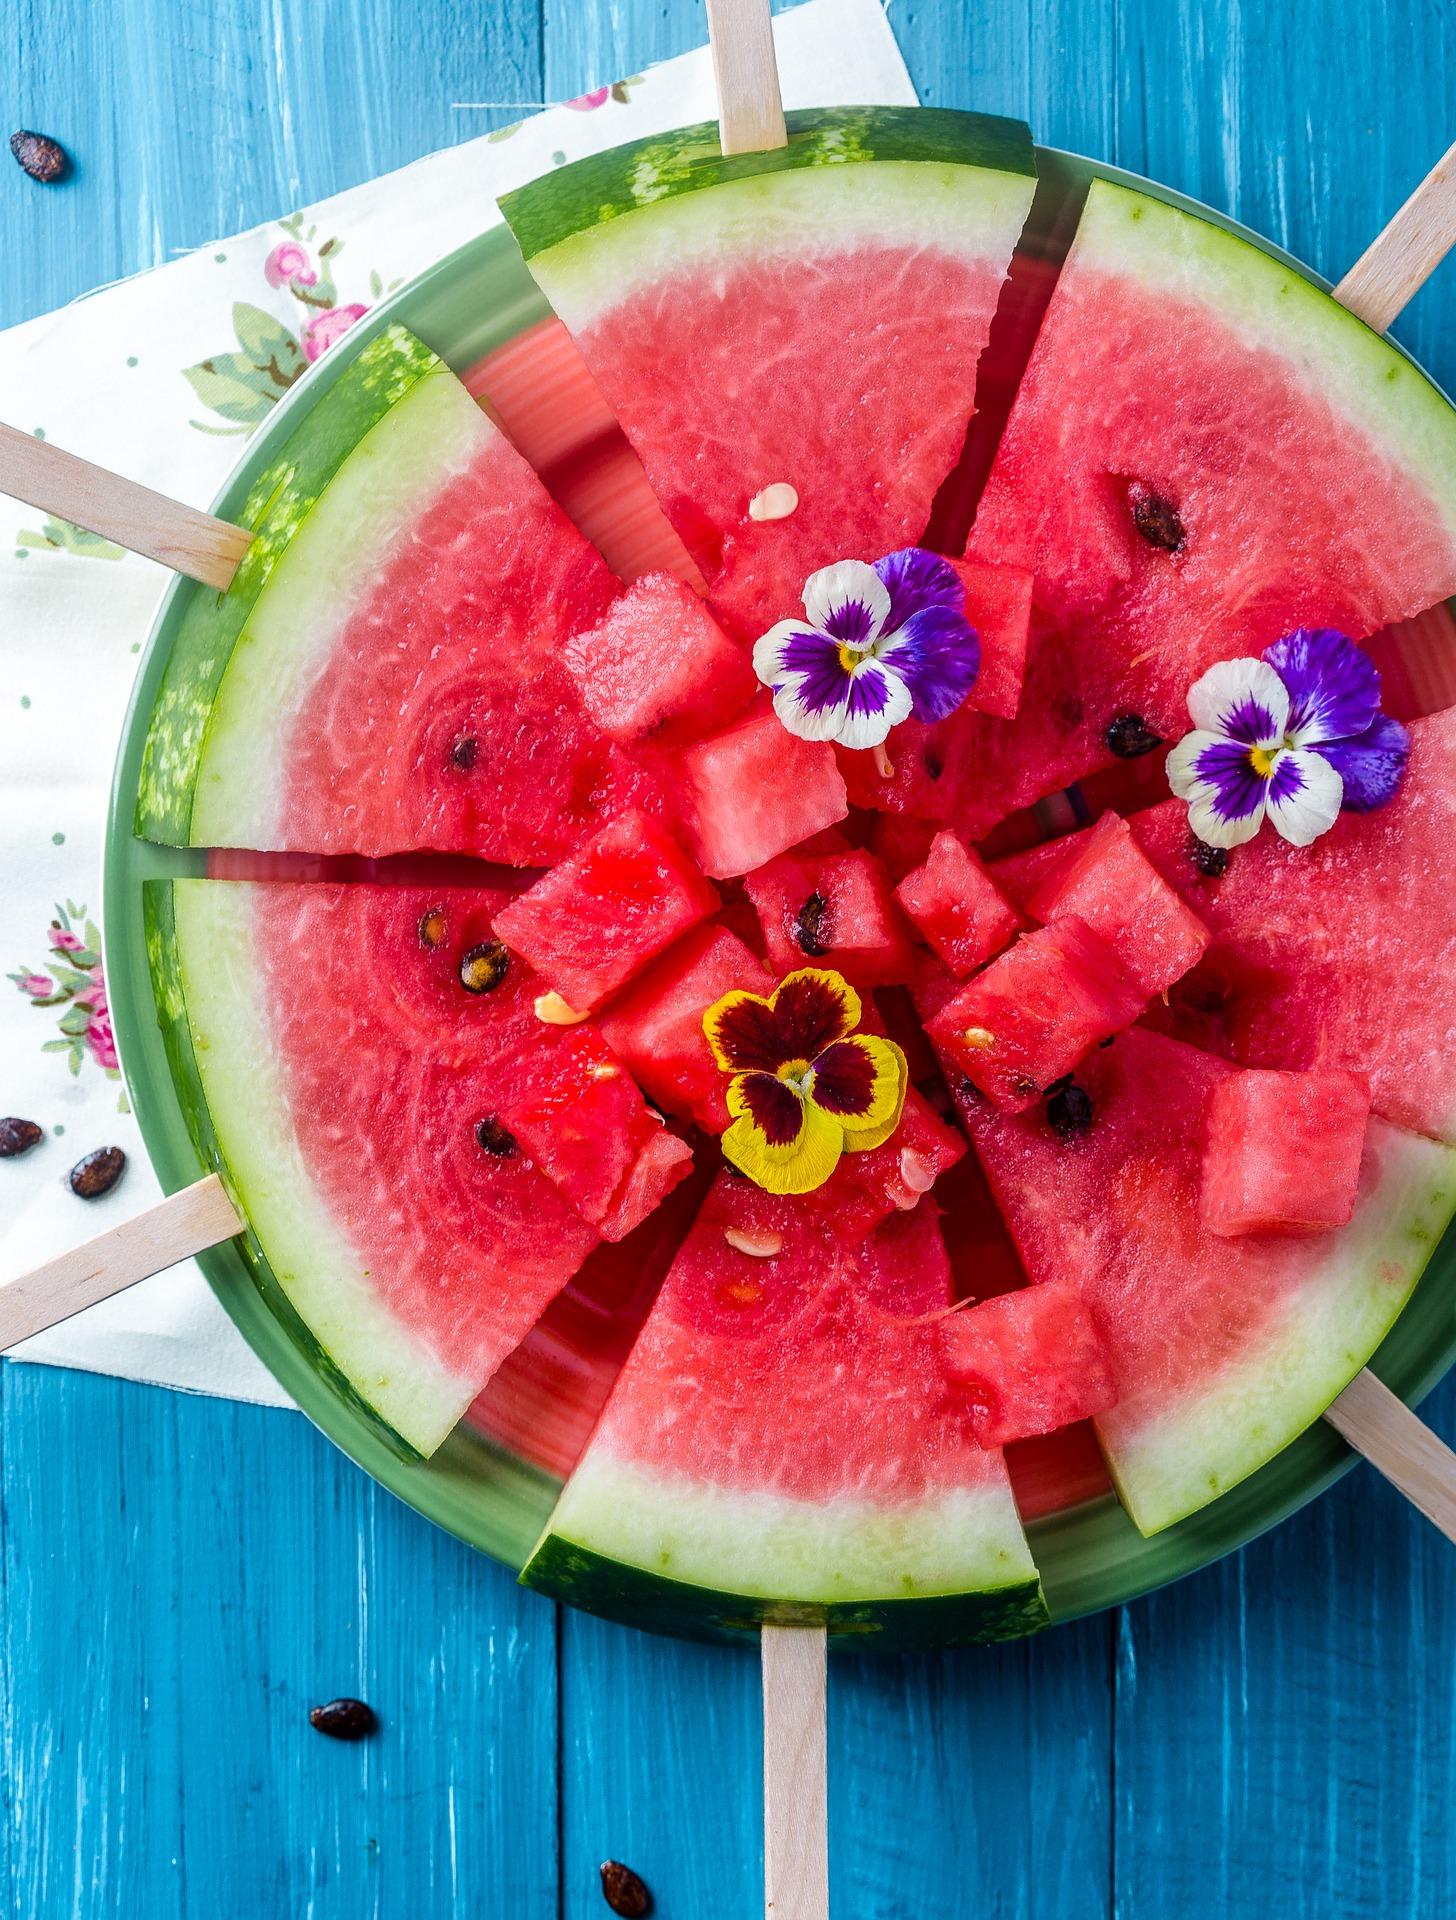 Simple Spiked Watermelon Dessert via @mermaidsandmojitos